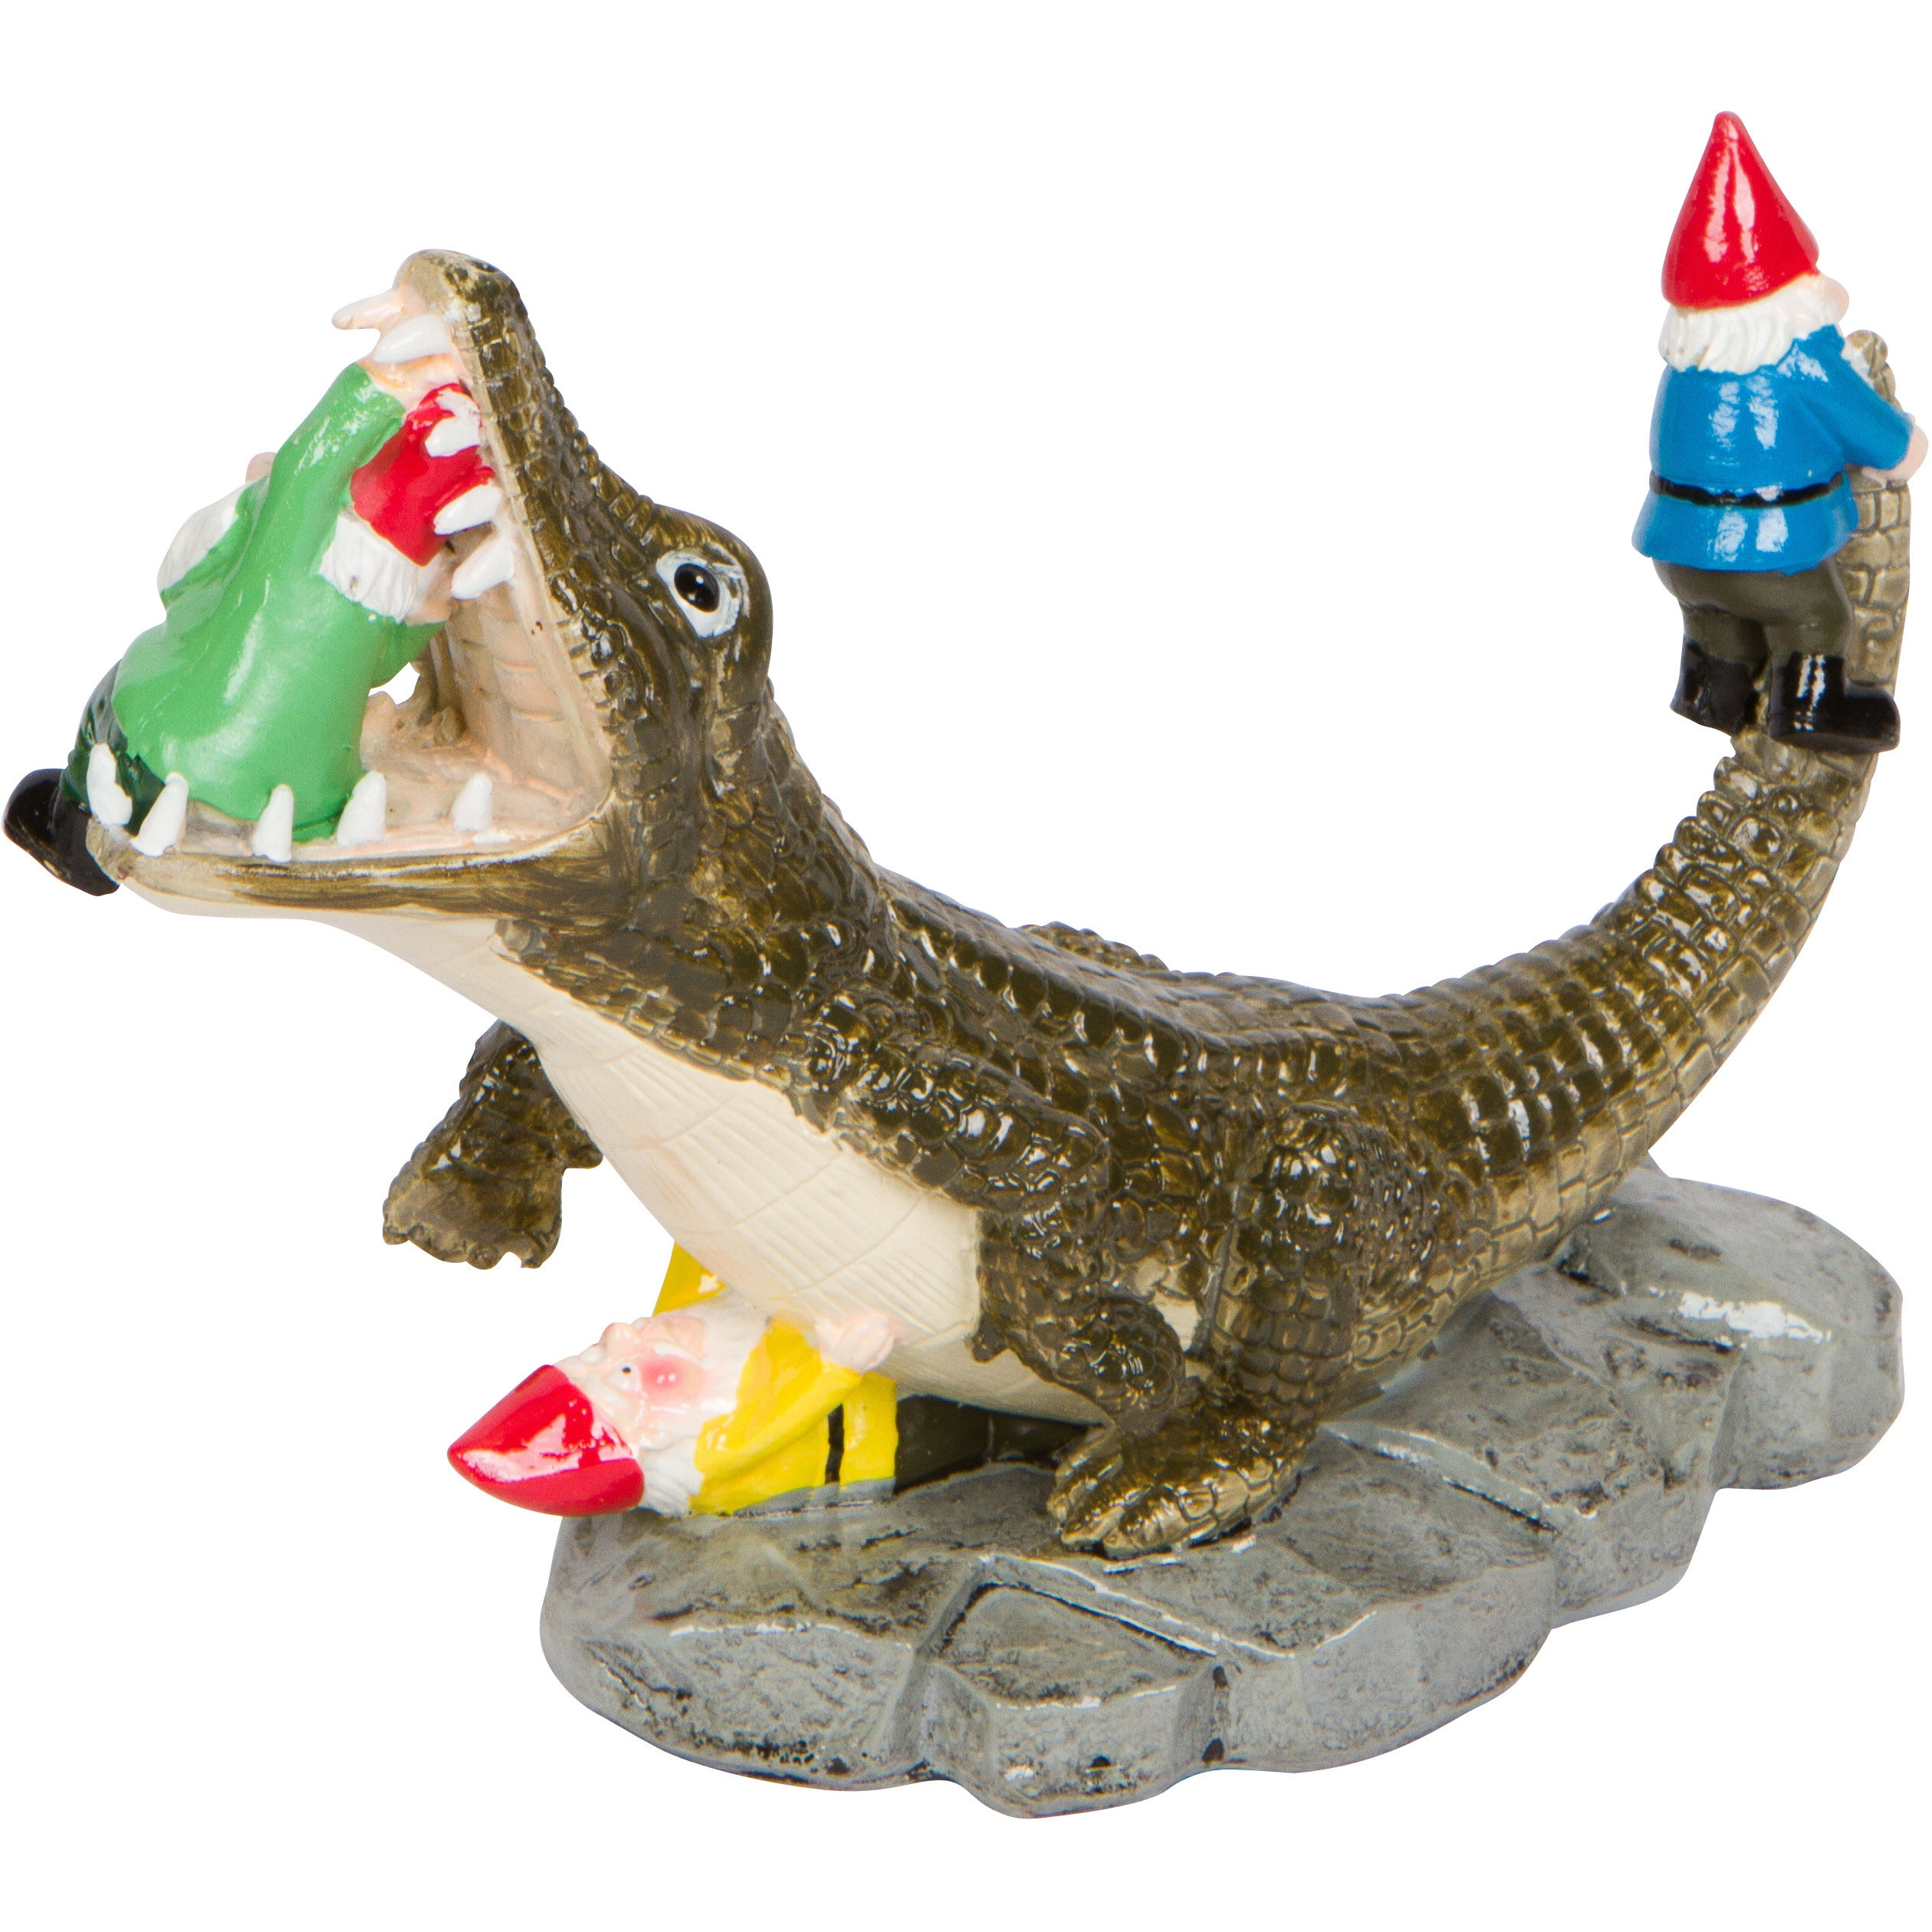 Hilarious Home 7-inch Alligator Garden Gnome Statue, Mult...